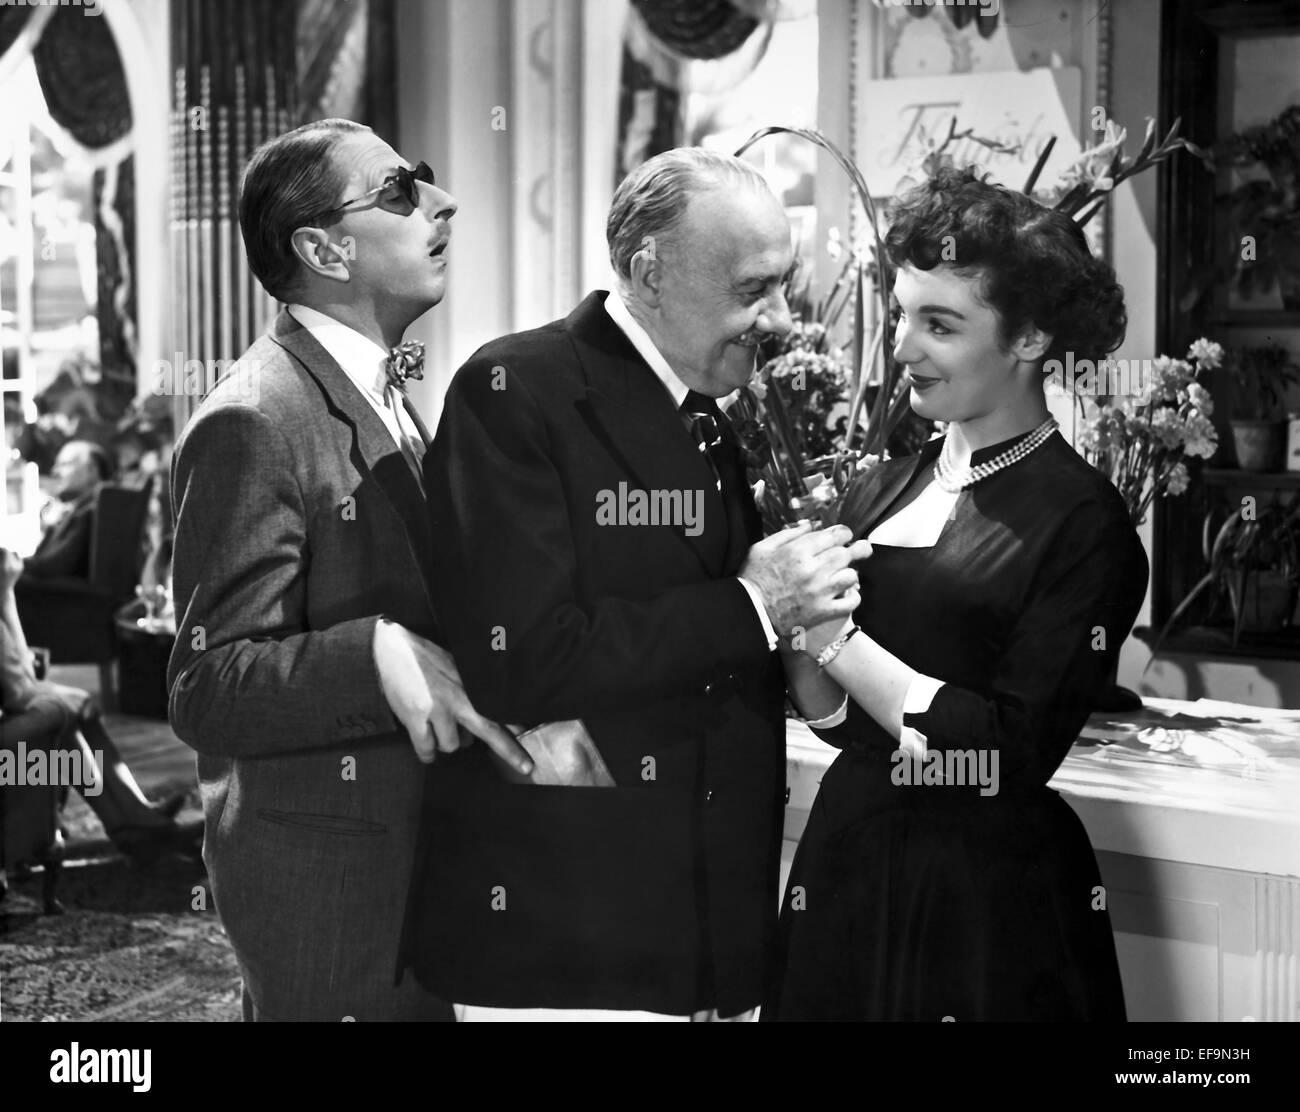 GEOFFREY SUMNER & RONALD SQUIRE ALWAYS A BRIDE (1953) - Stock Image